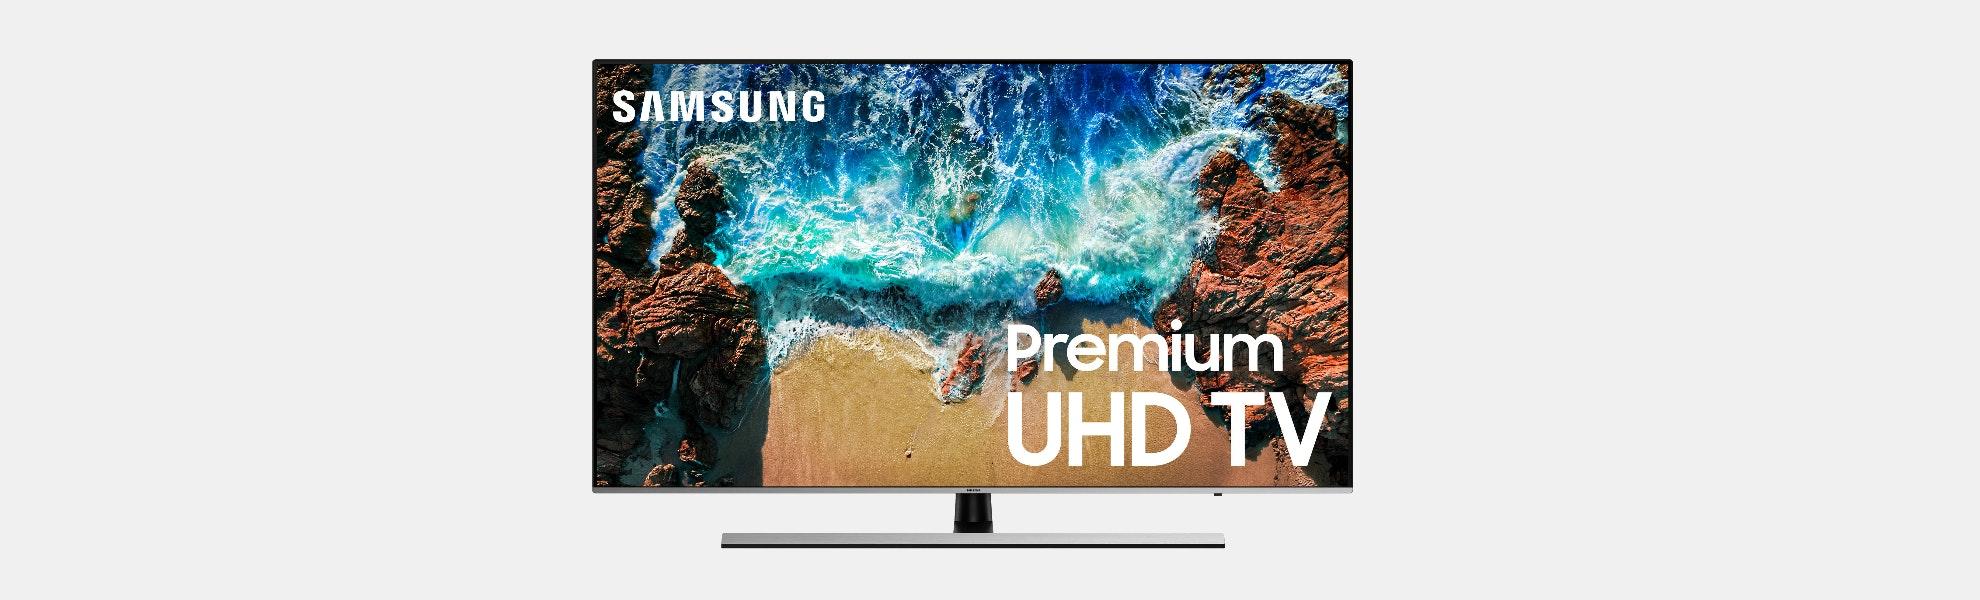 "Samsung 65NU8000 65"" Premium Smart 4K UHD TV (2018)"